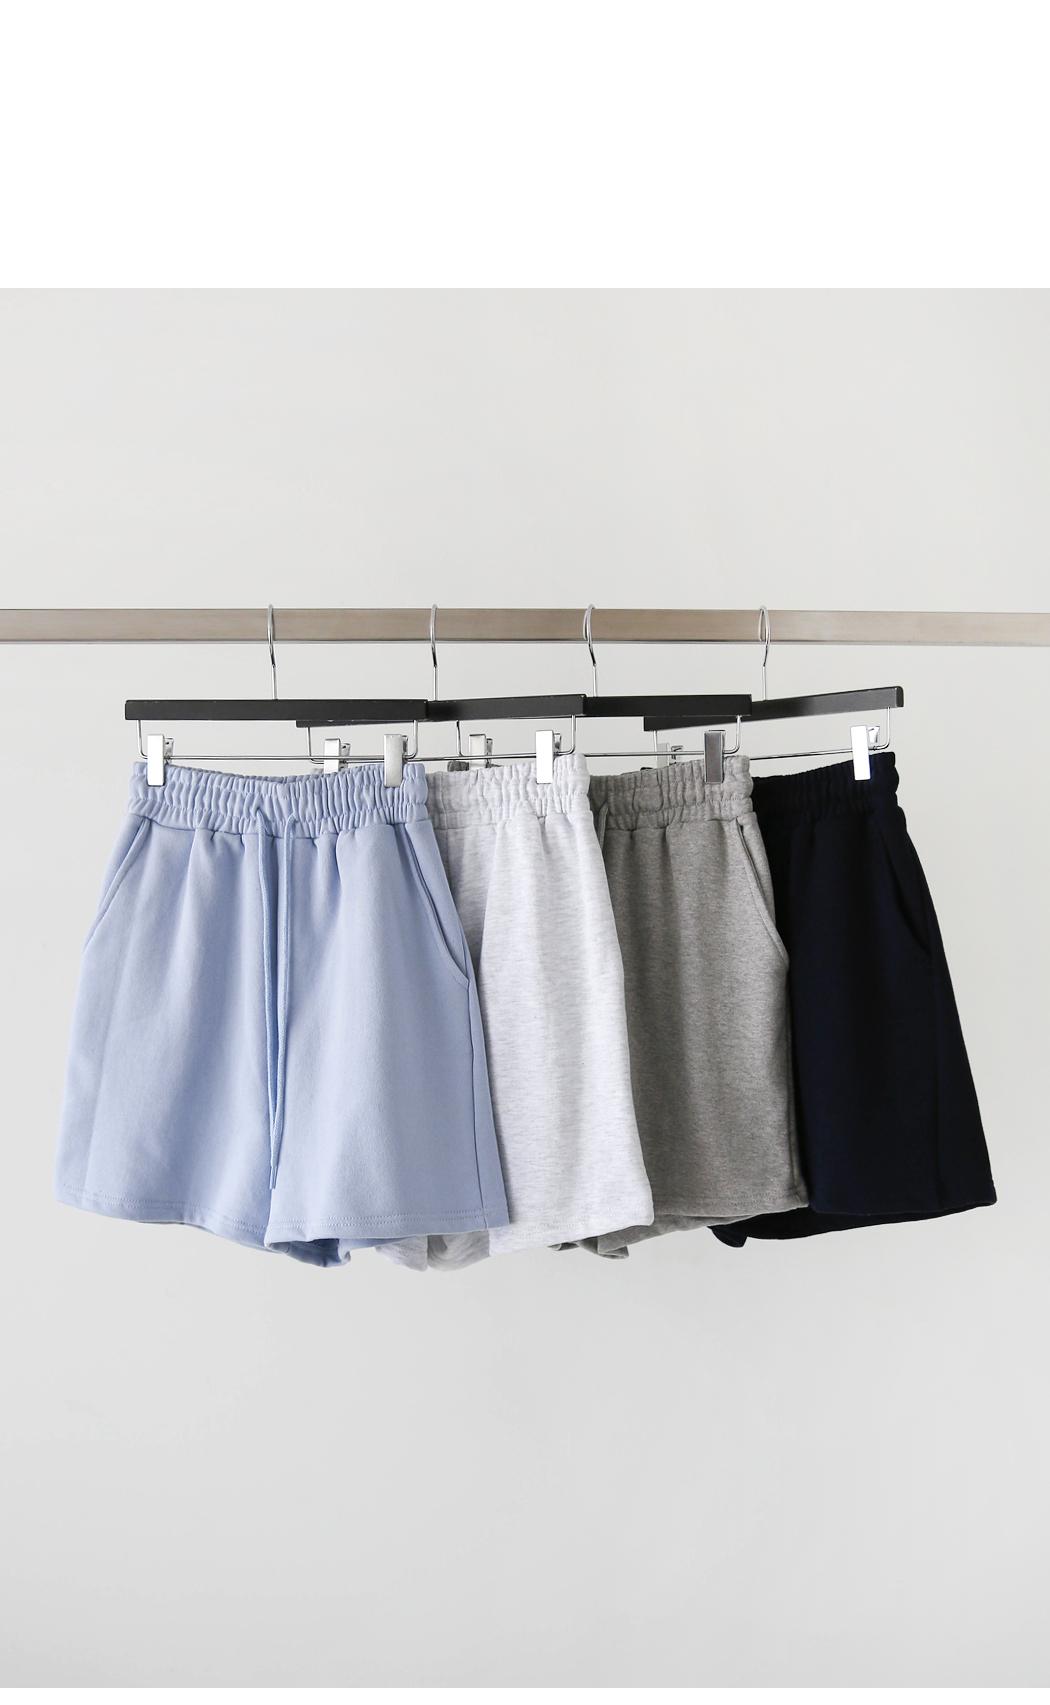 Come Home Training Banding Pants